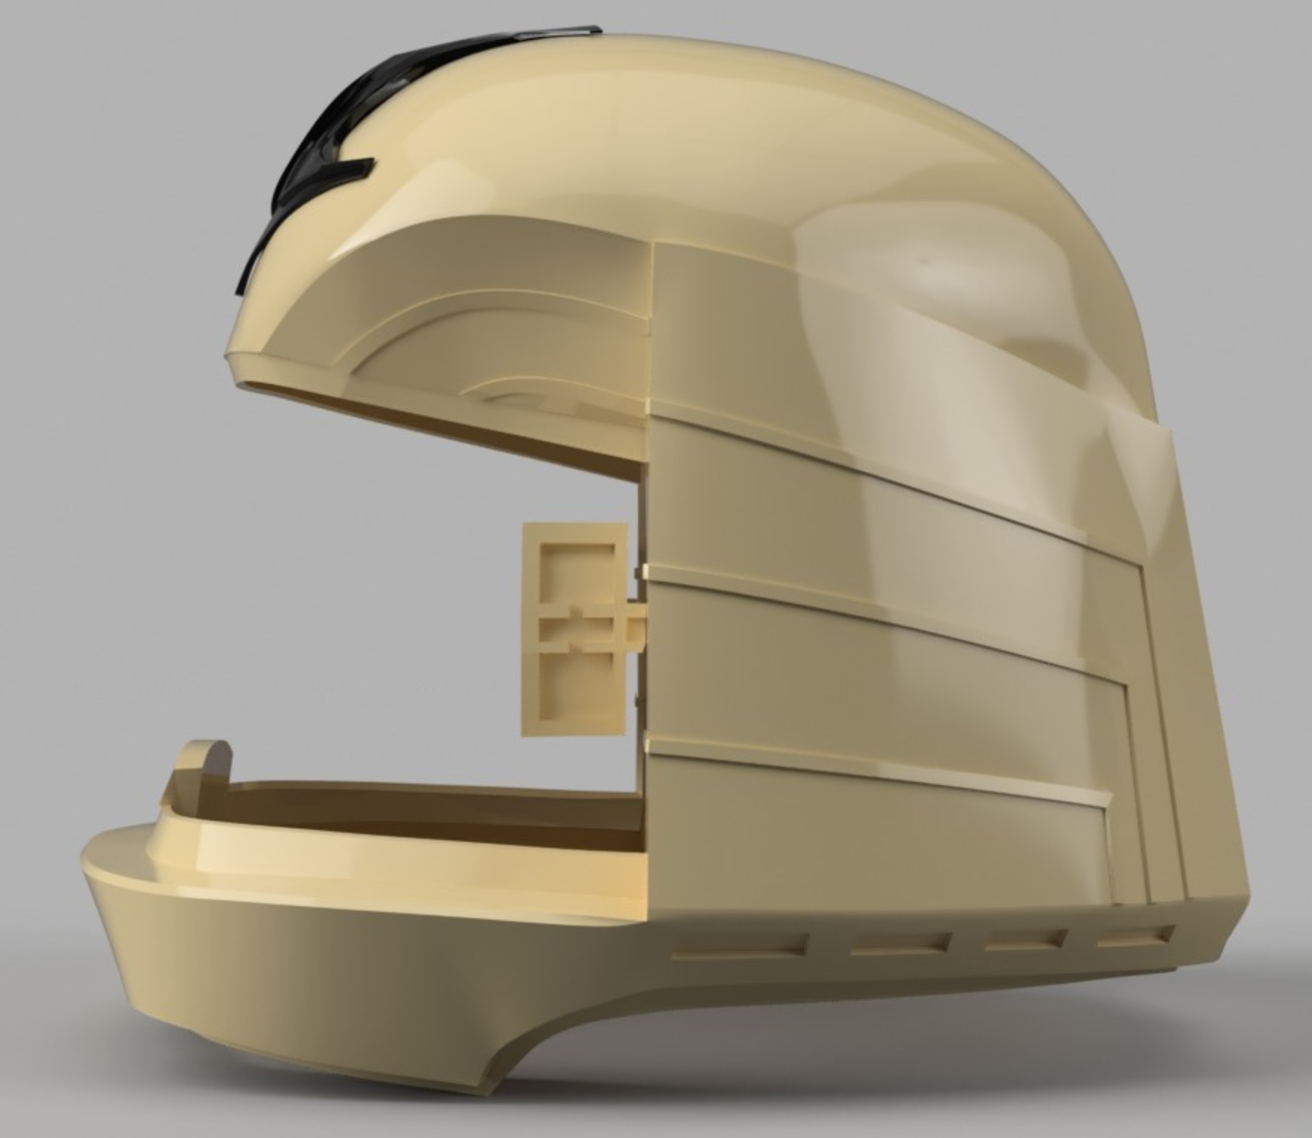 Capture d'écran 2017-09-15 à 16.16.22.png Download free STL file Battlestar Galactica Colonial Viper Pilot Helmet • 3D printing object, VillainousPropShop